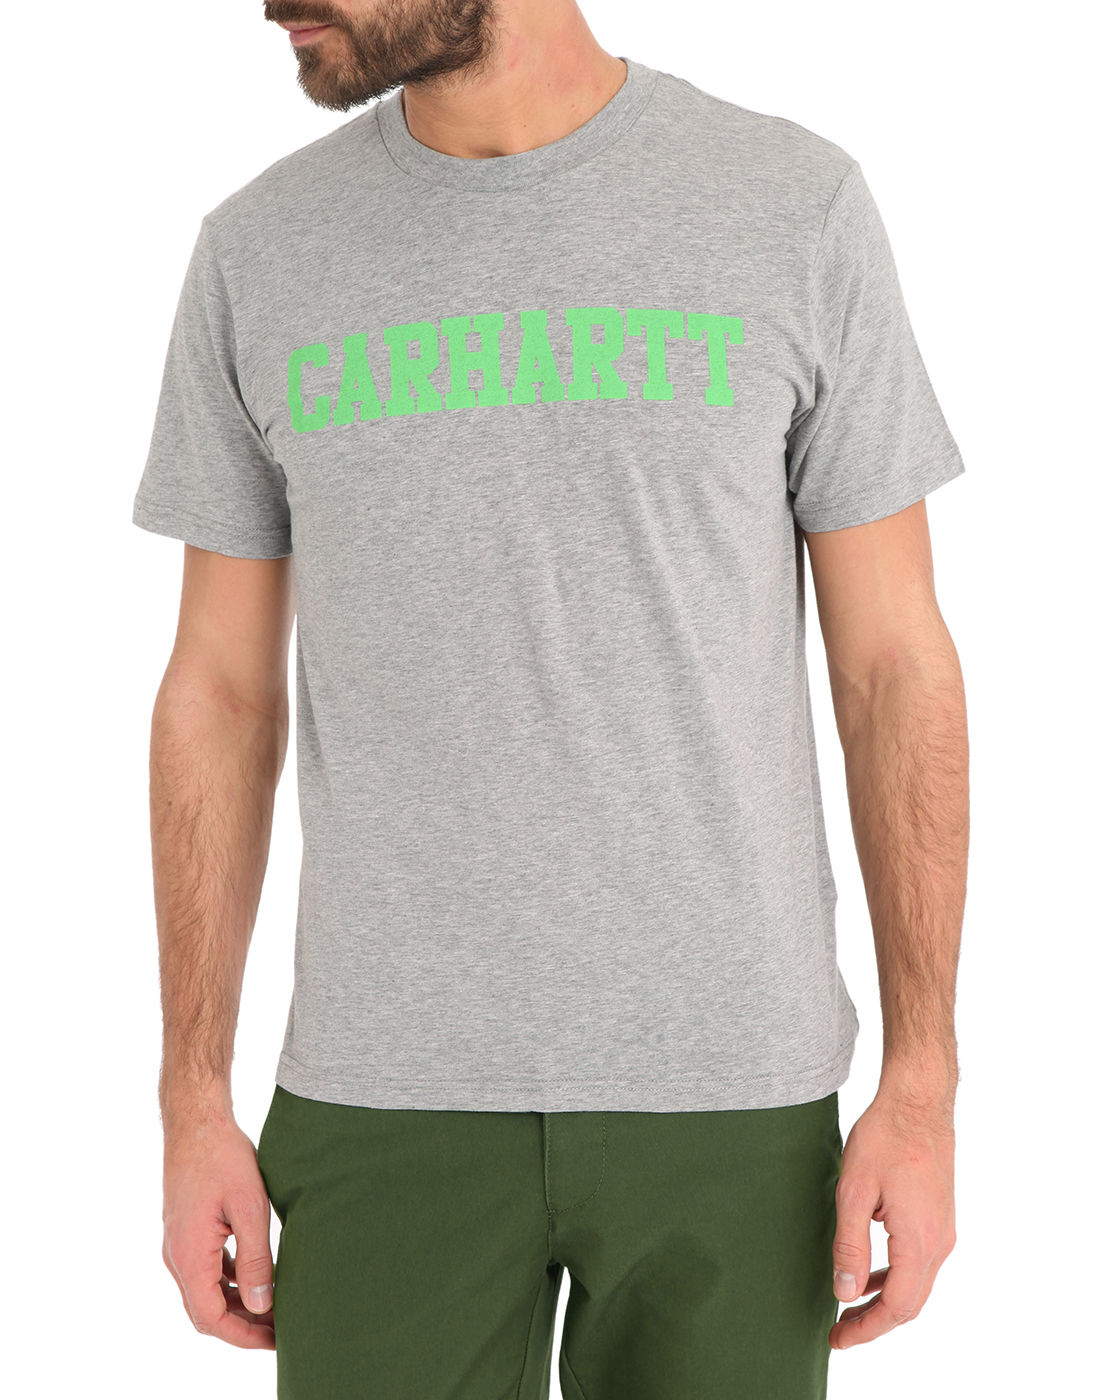 carhartt mottled grey college t shirt in gray for men lyst